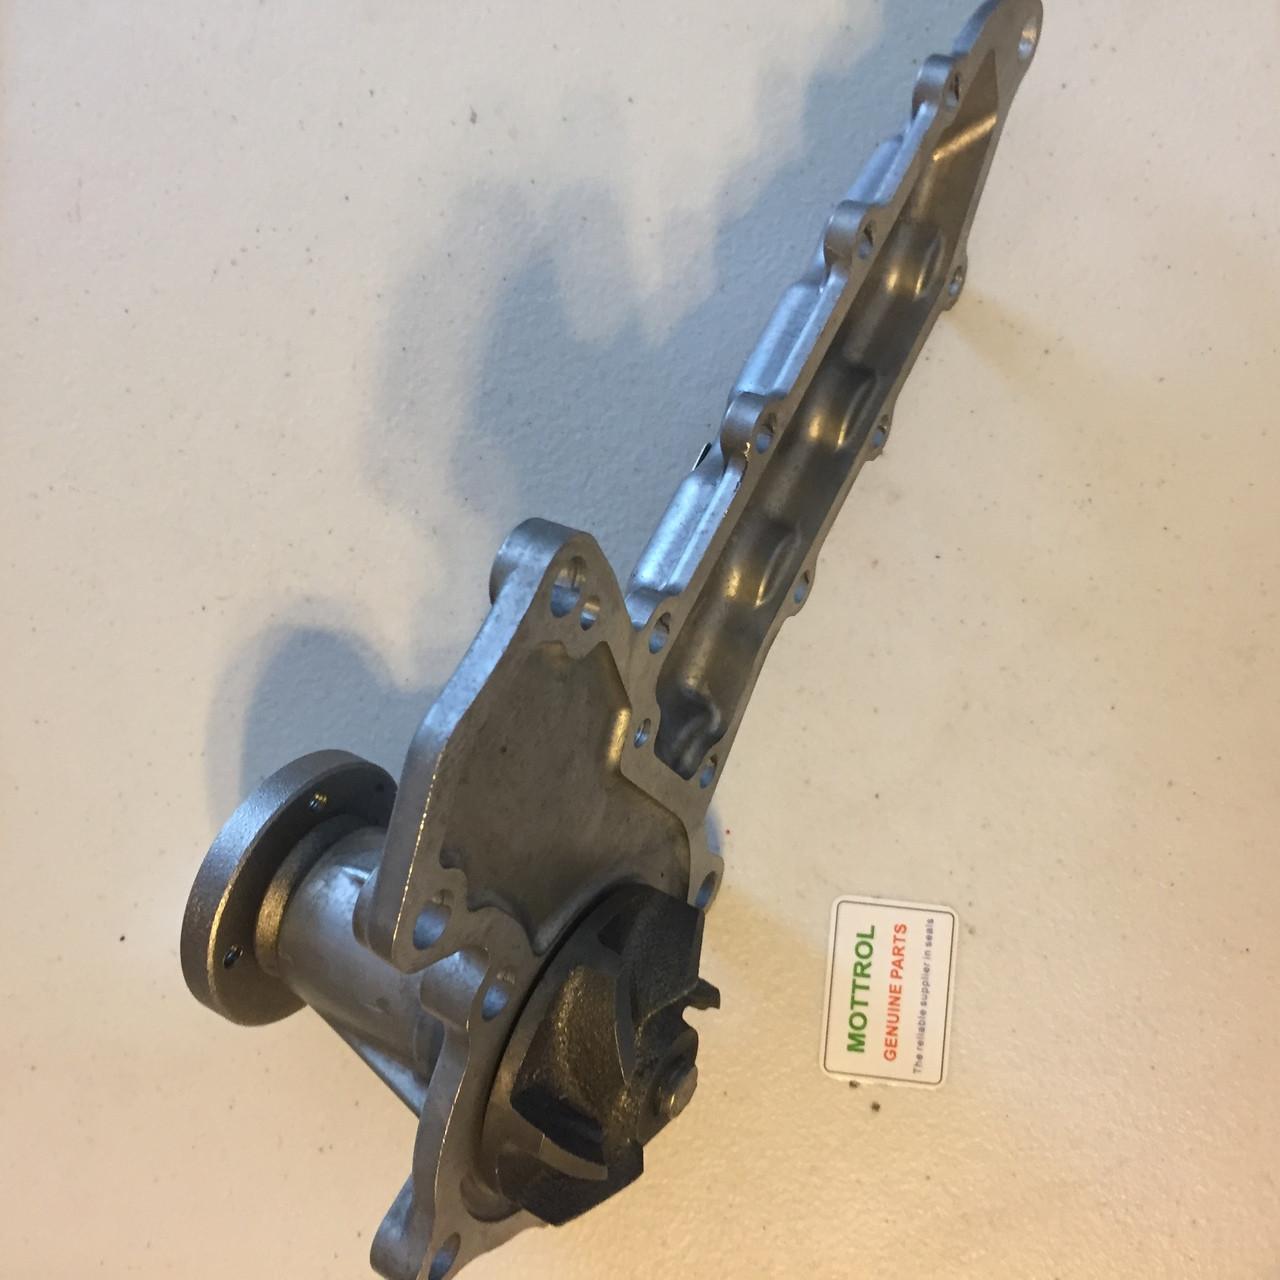 small resolution of 15521 73039 water pump fits bobcat skid steer loader 743b 753g 763 kubota v2403